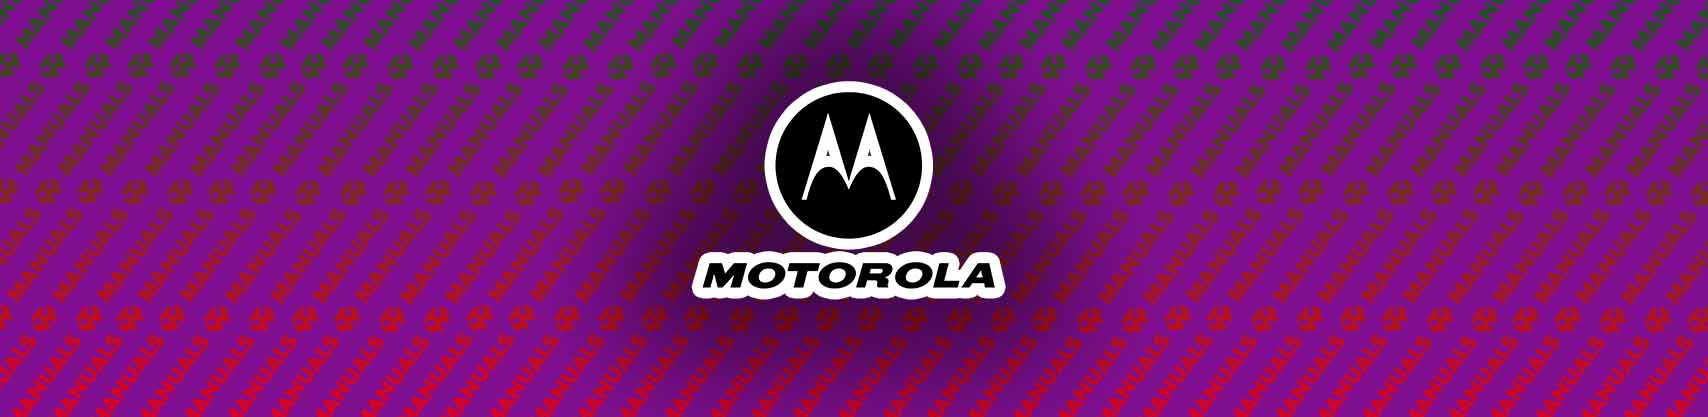 Motorola S11-HD Manual